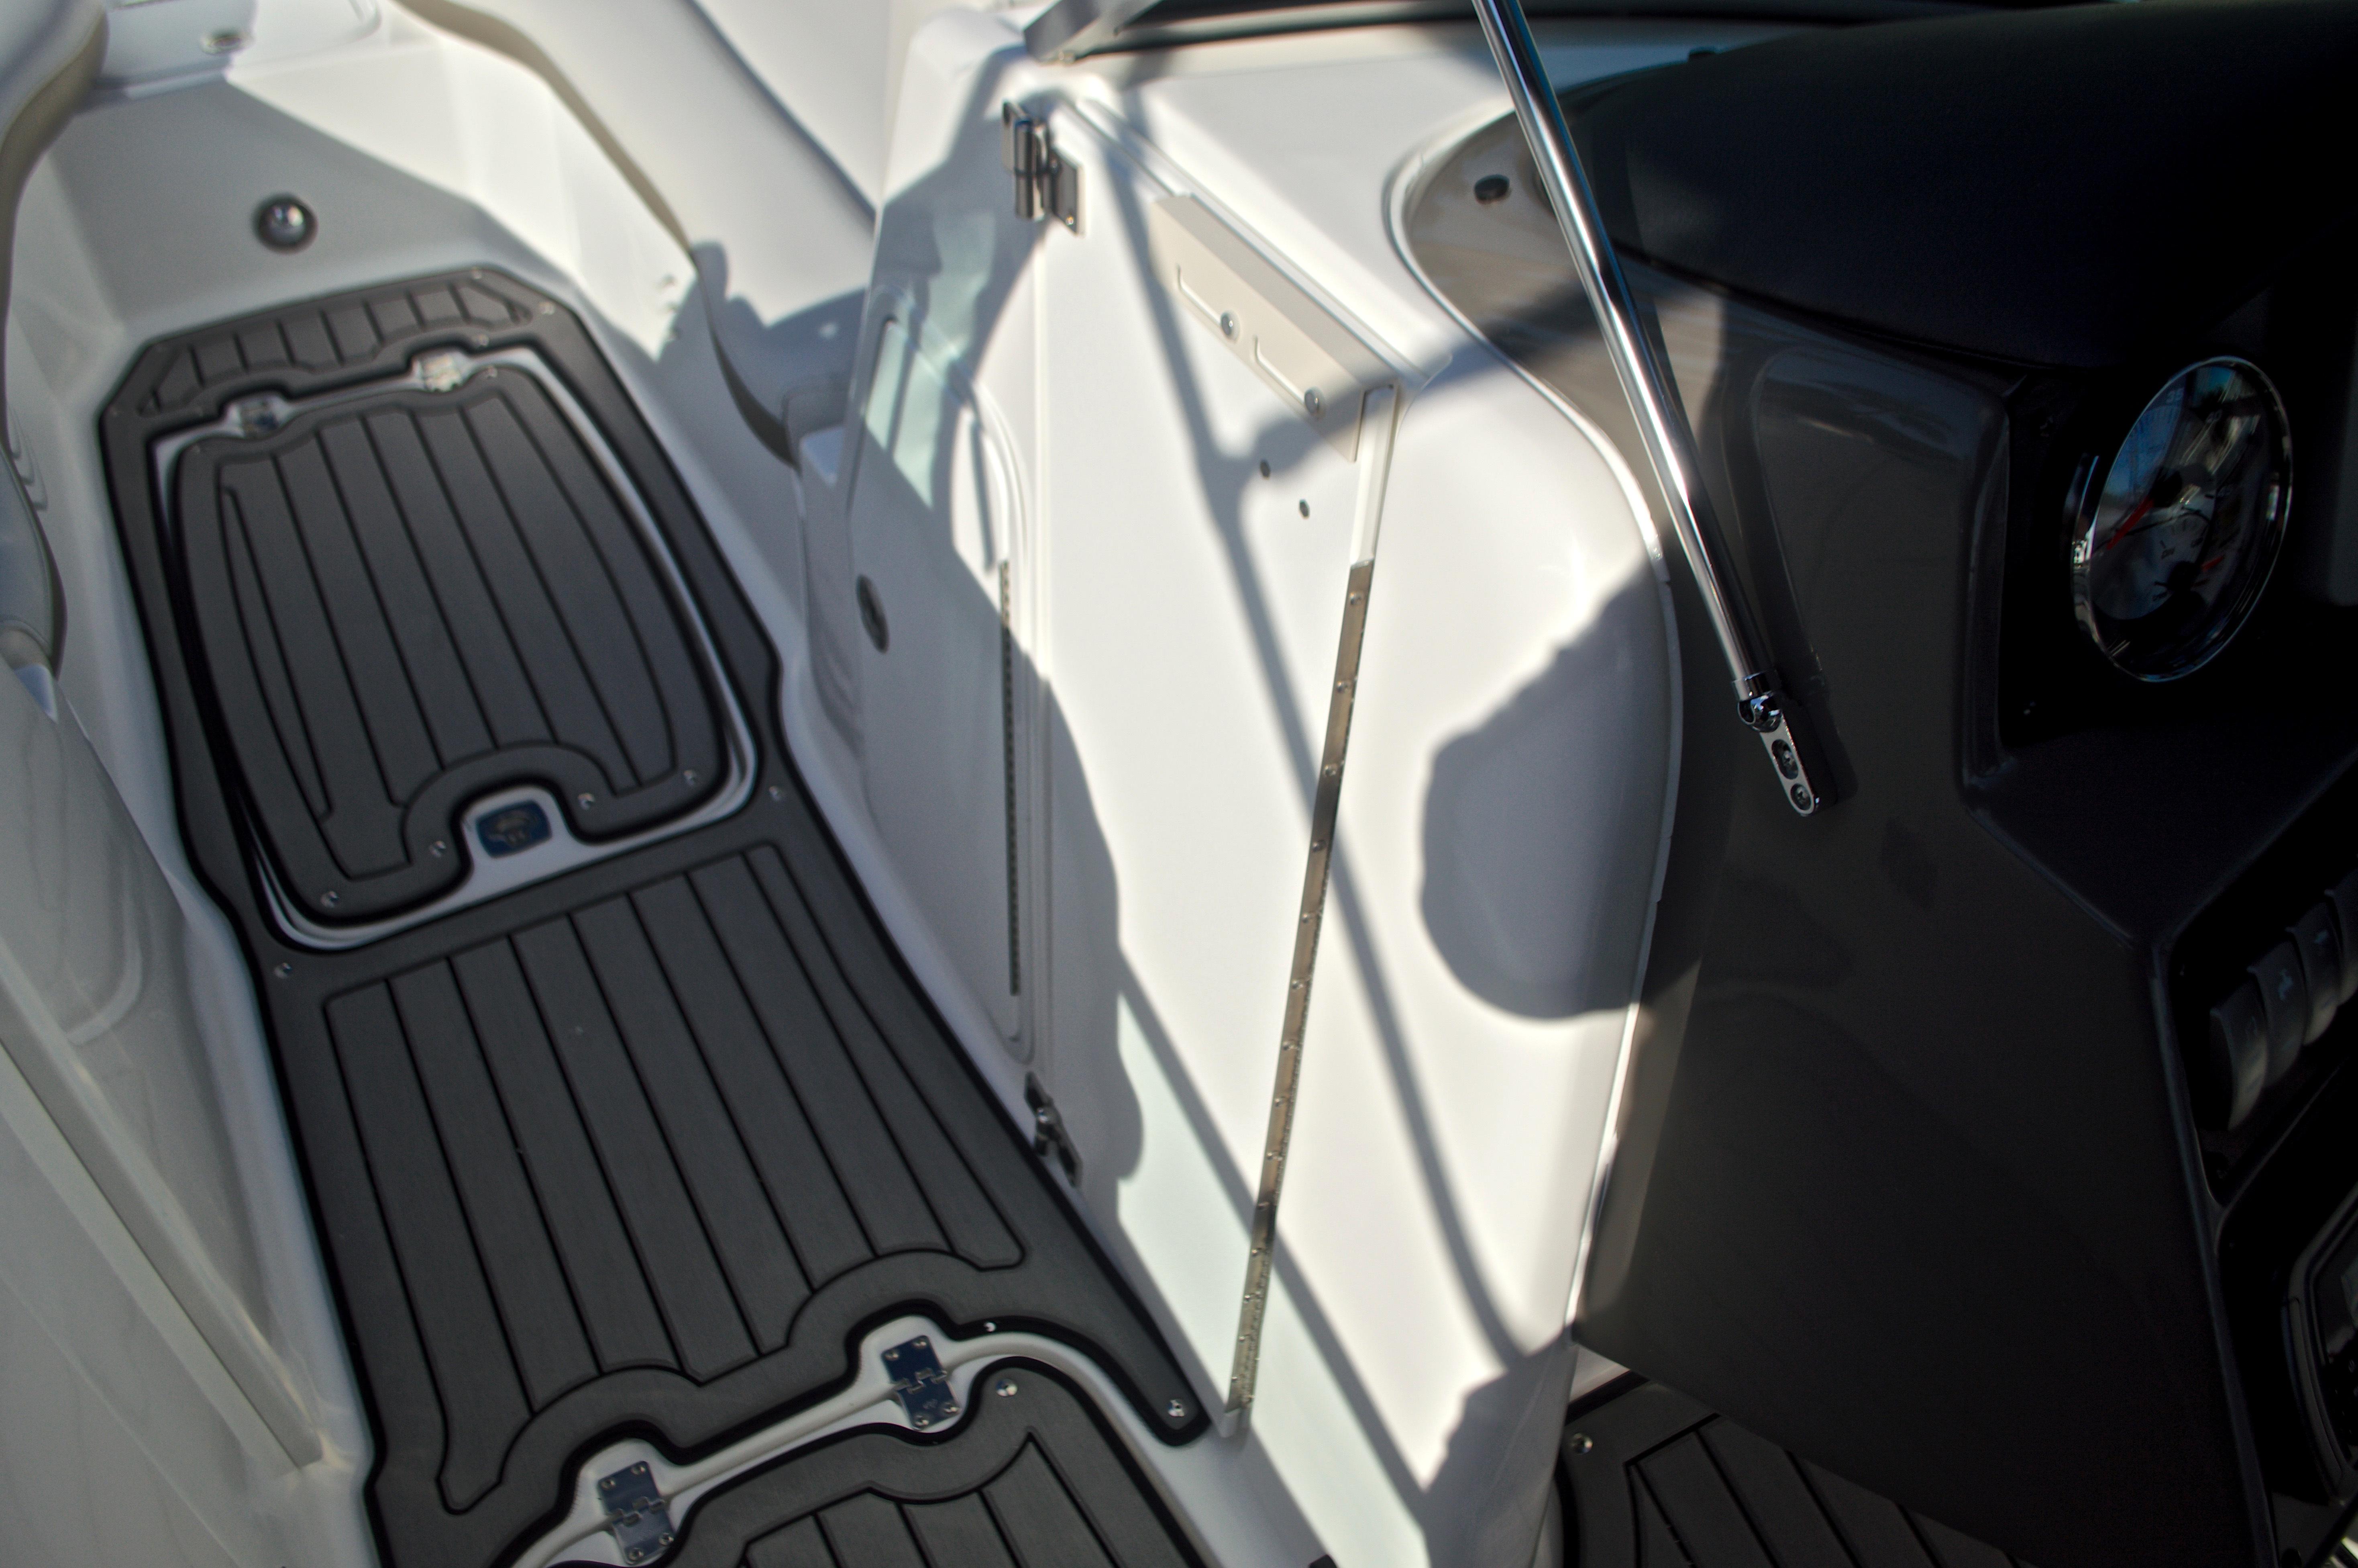 Thumbnail 52 for New 2017 Hurricane SunDeck SD 2400 OB boat for sale in Miami, FL